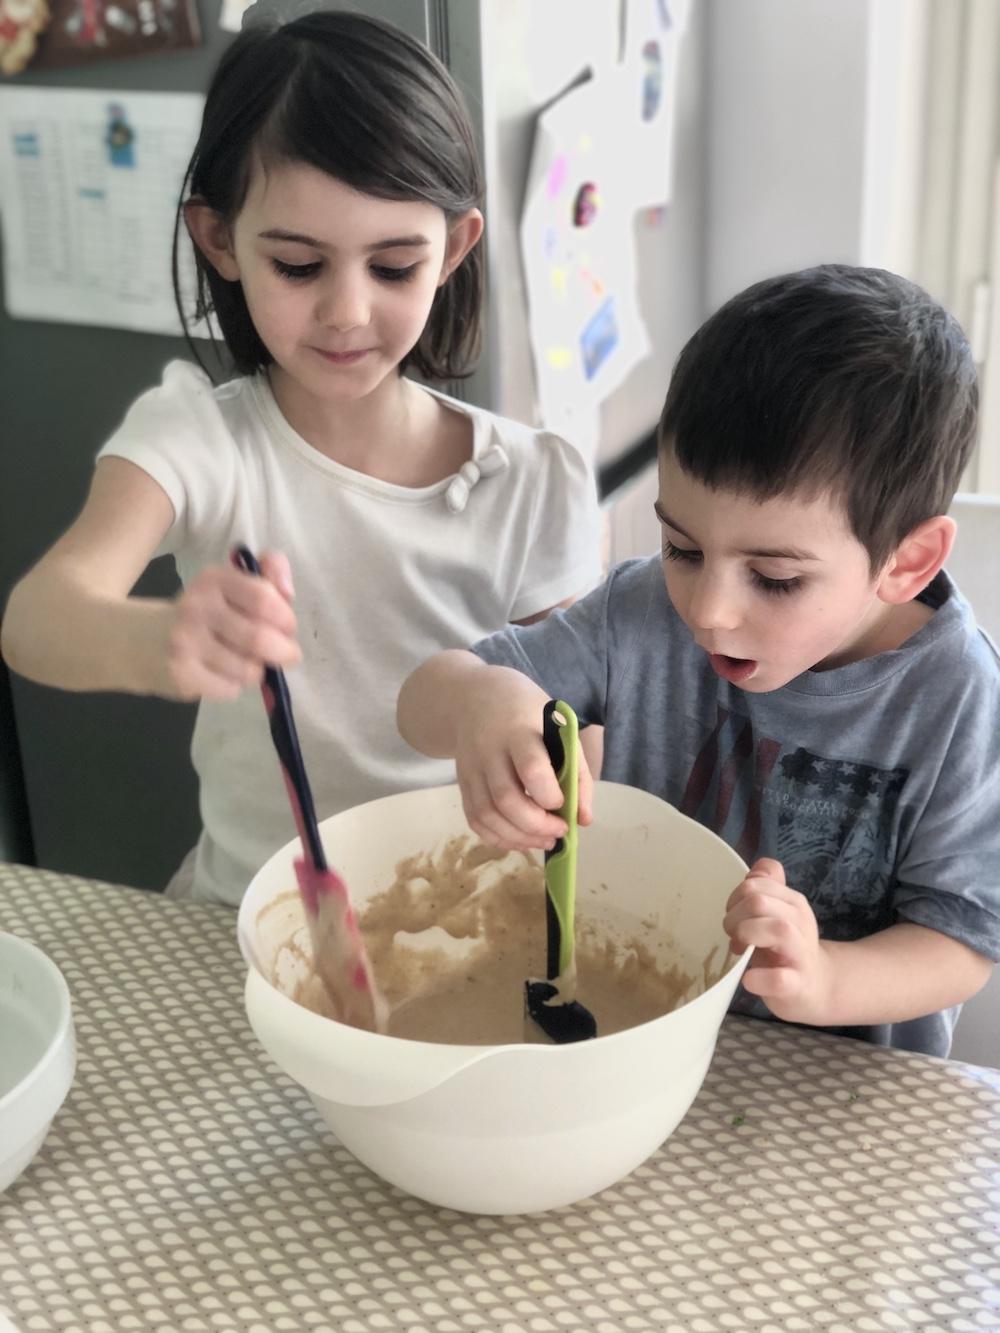 bambini-preparano-dolce